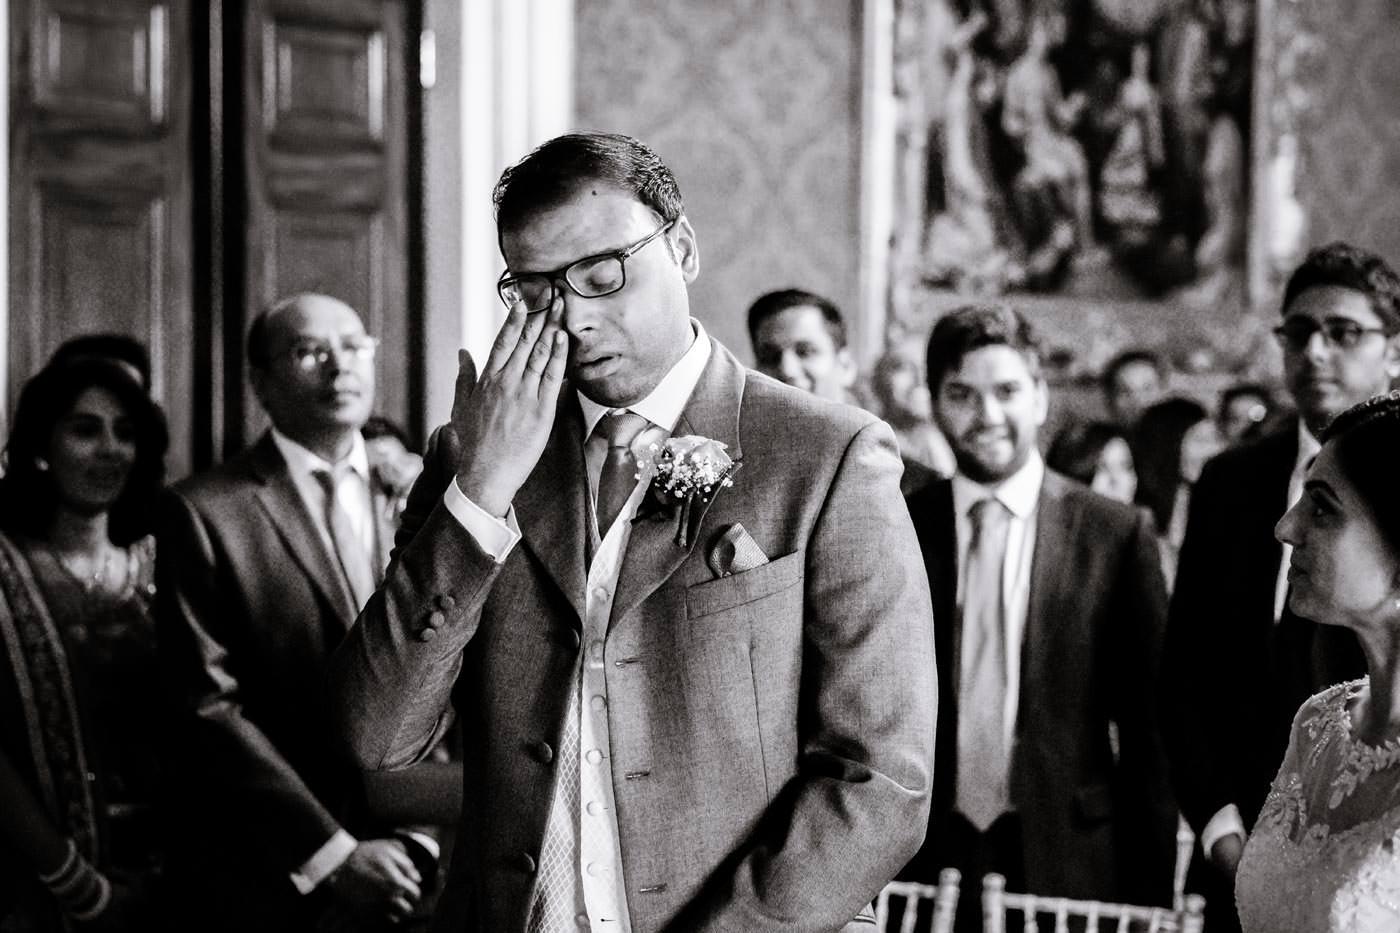 Tearful Indian groom at seeing his bride